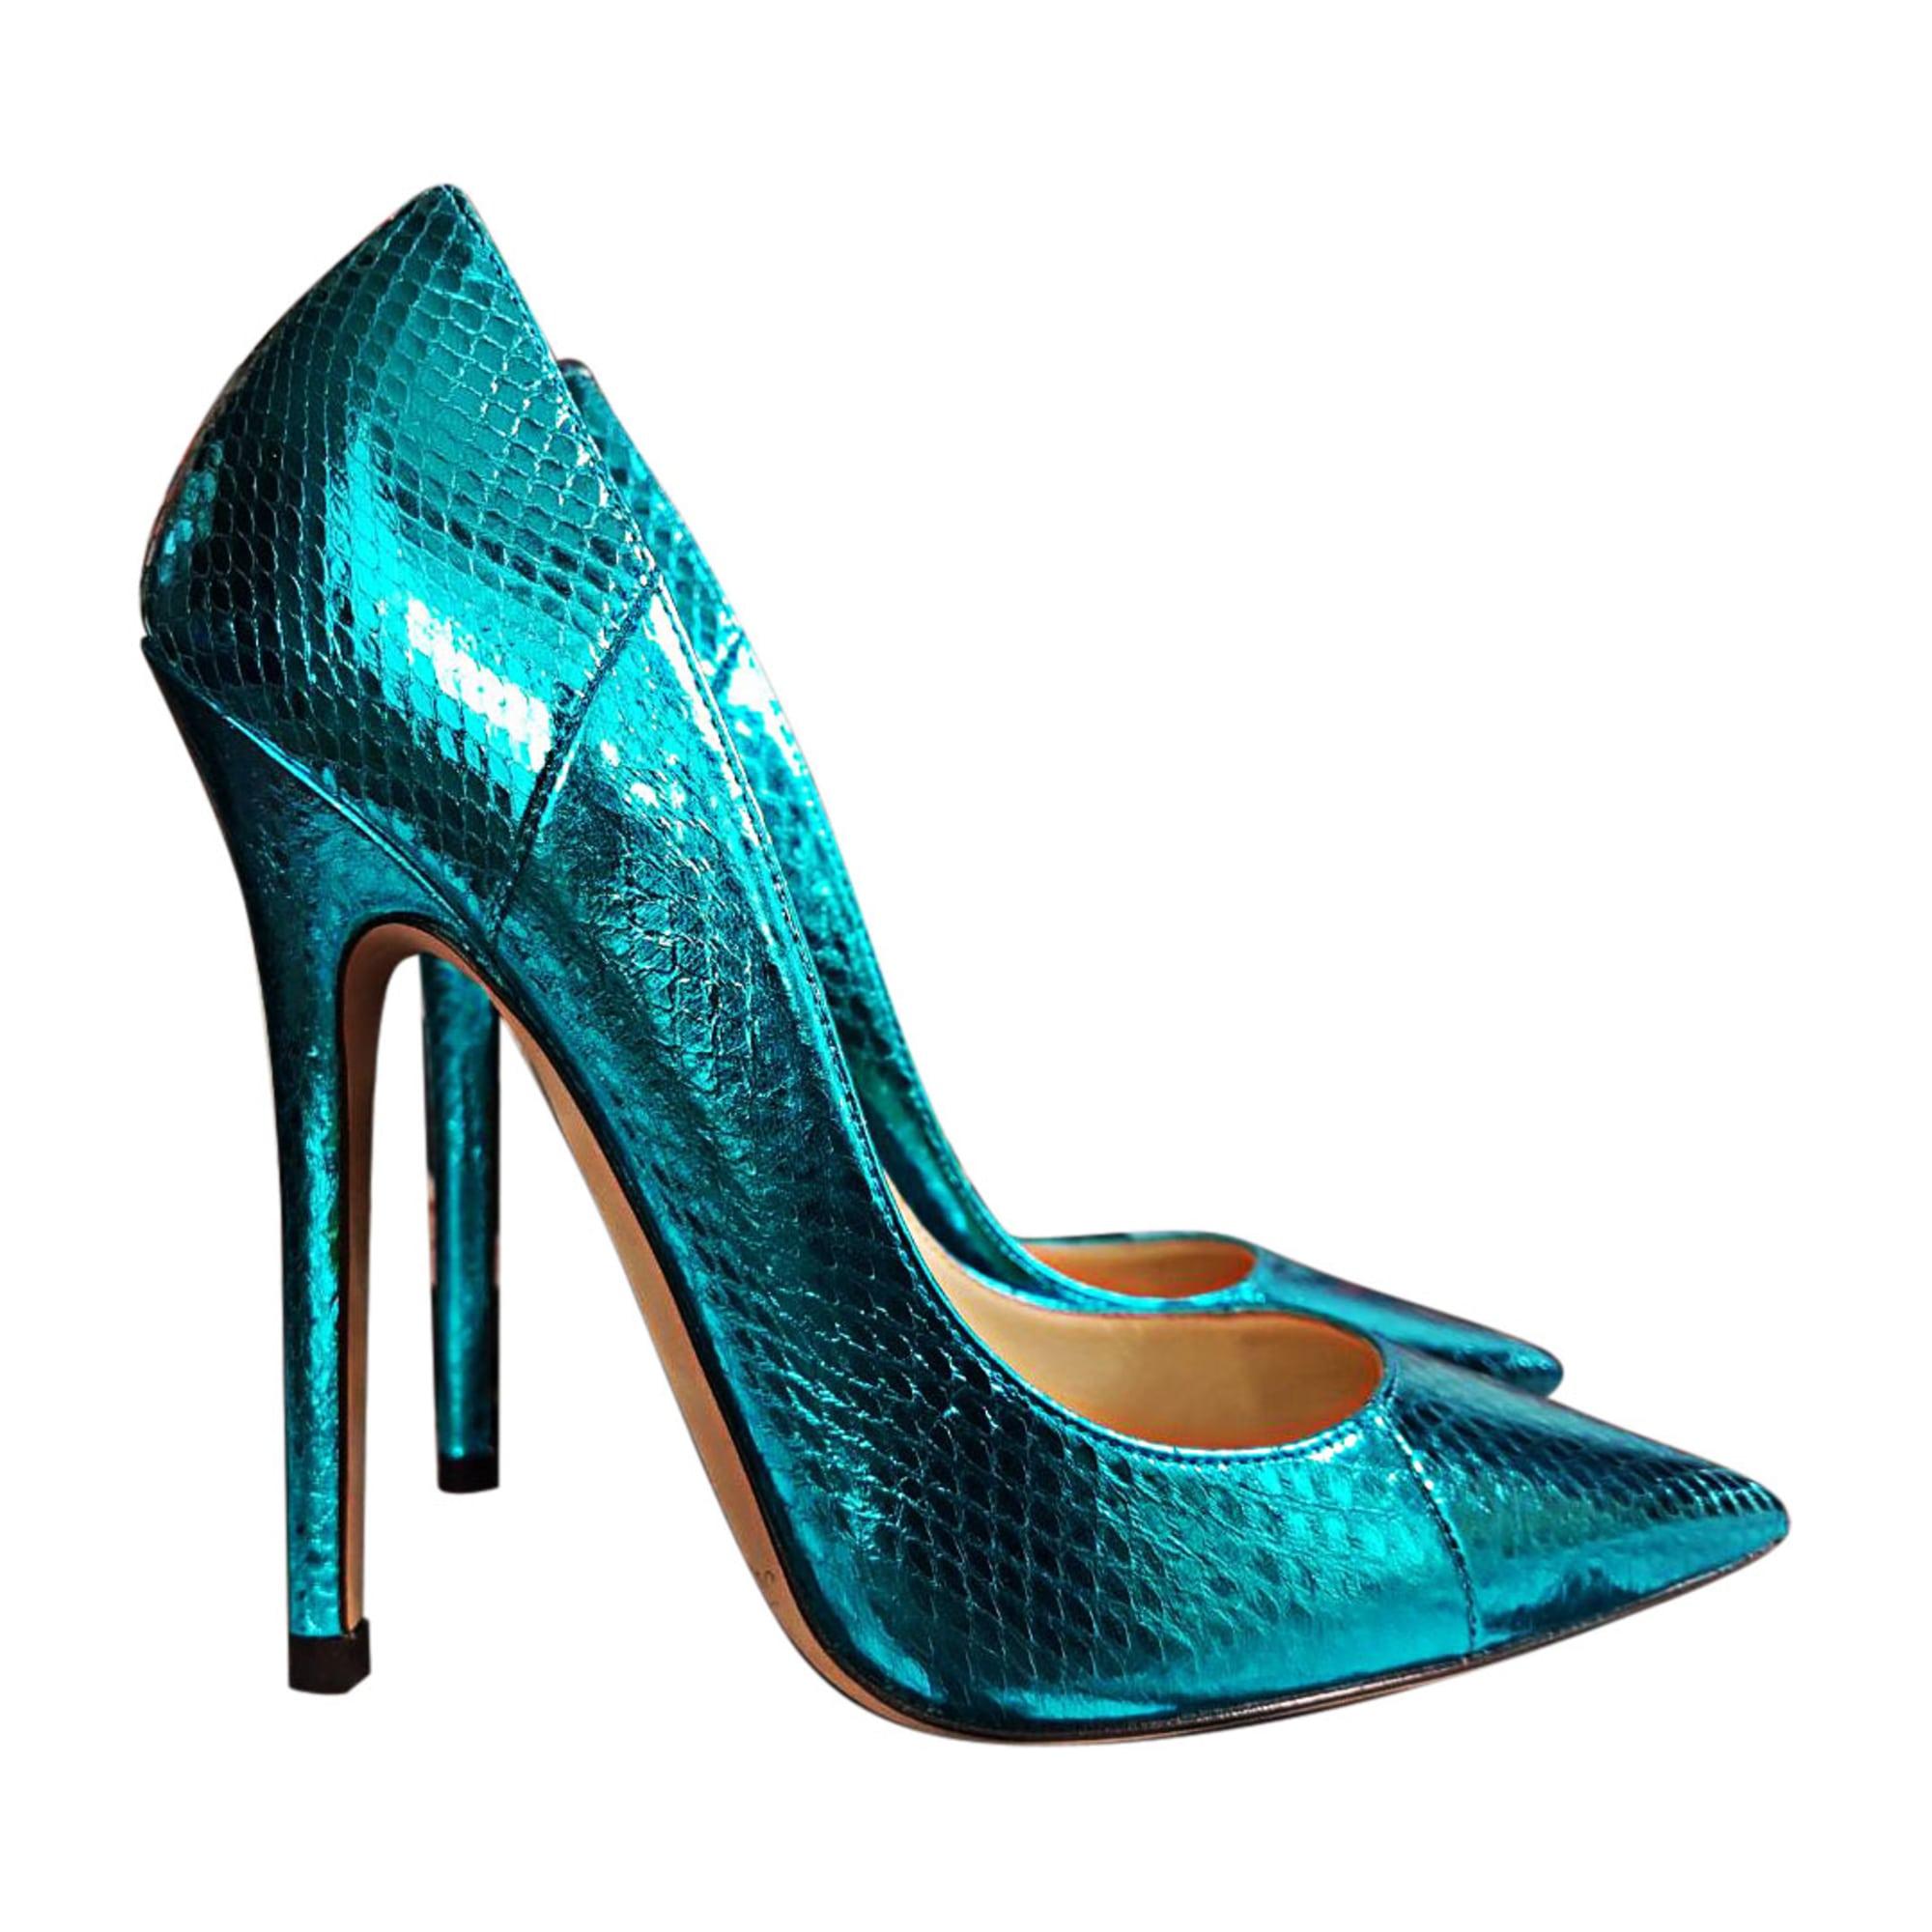 8d54264b5382 ... authentic pumps heels jimmy choo blue navy turquoise bbeea 7502c